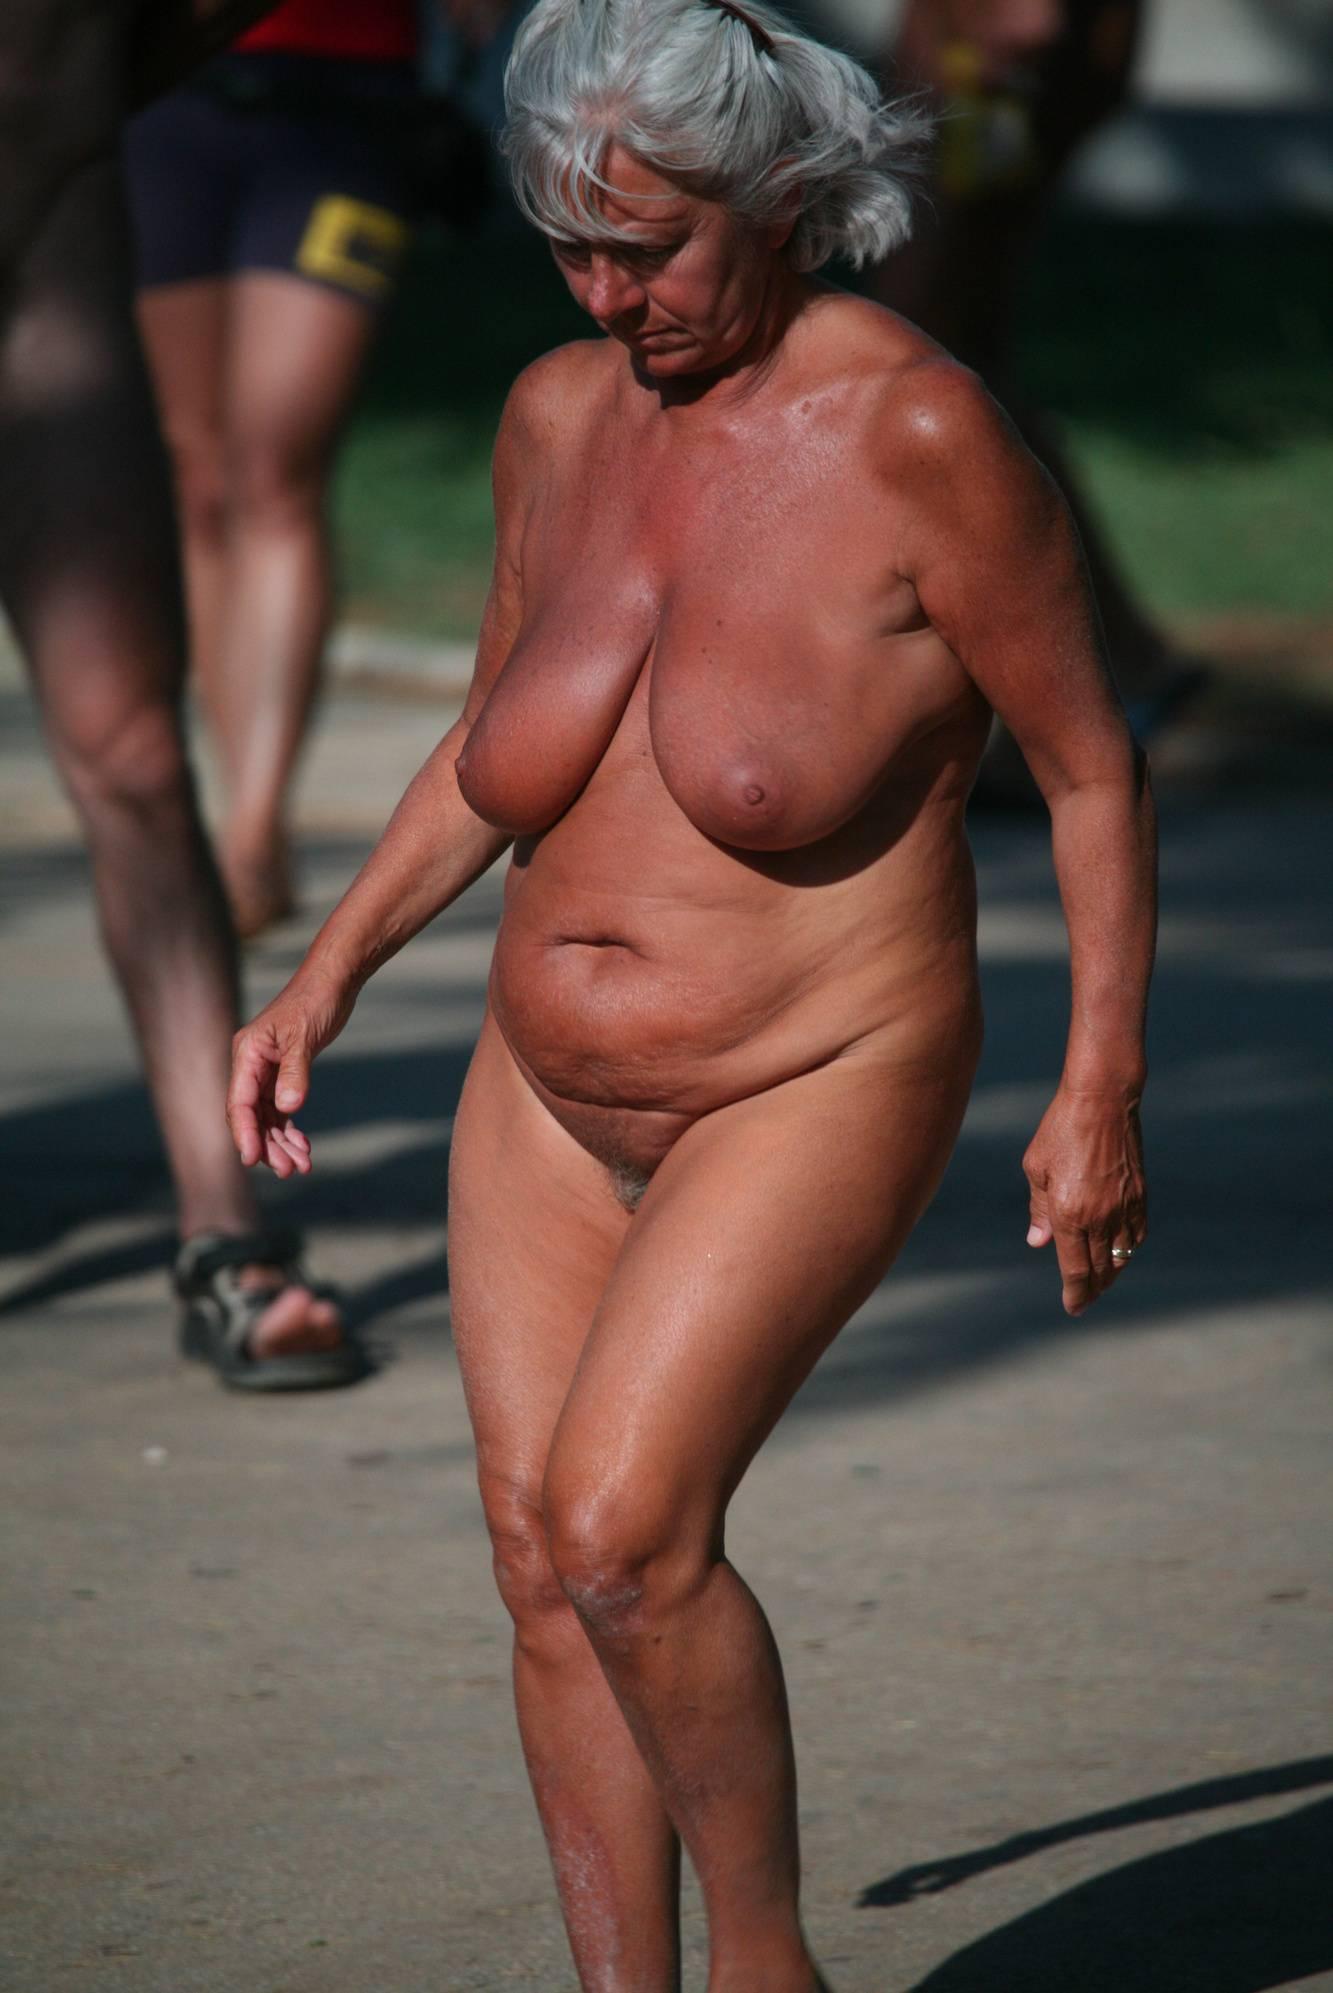 Nudist Photos Pier FKK Lake-Side Park - 2